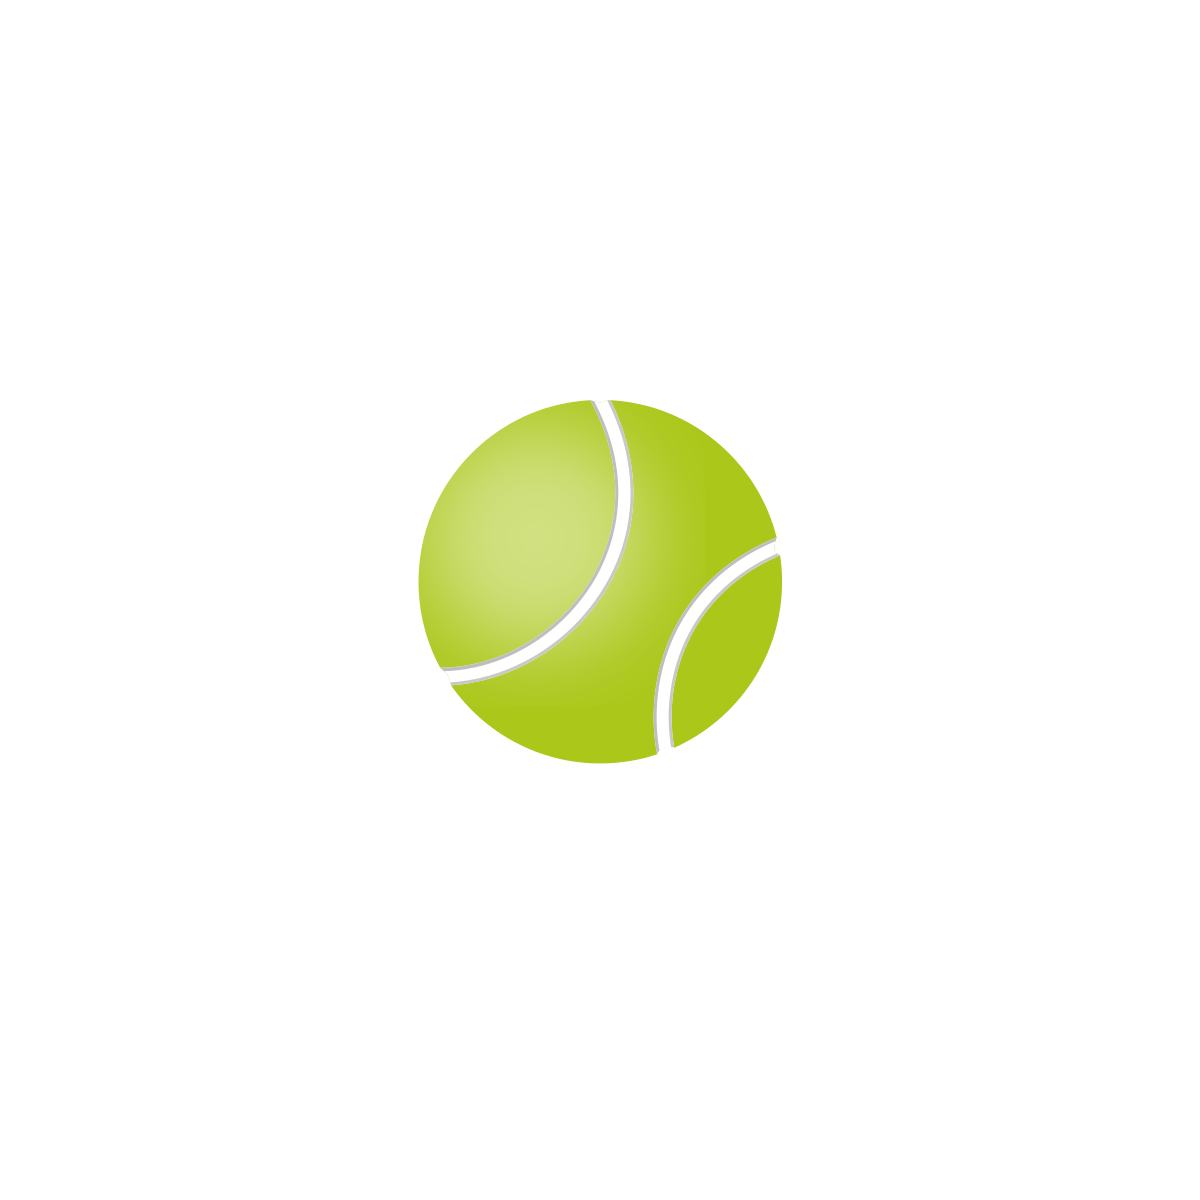 Pin By Printer On Tennis Ball Tennis Ball Tennis Ball